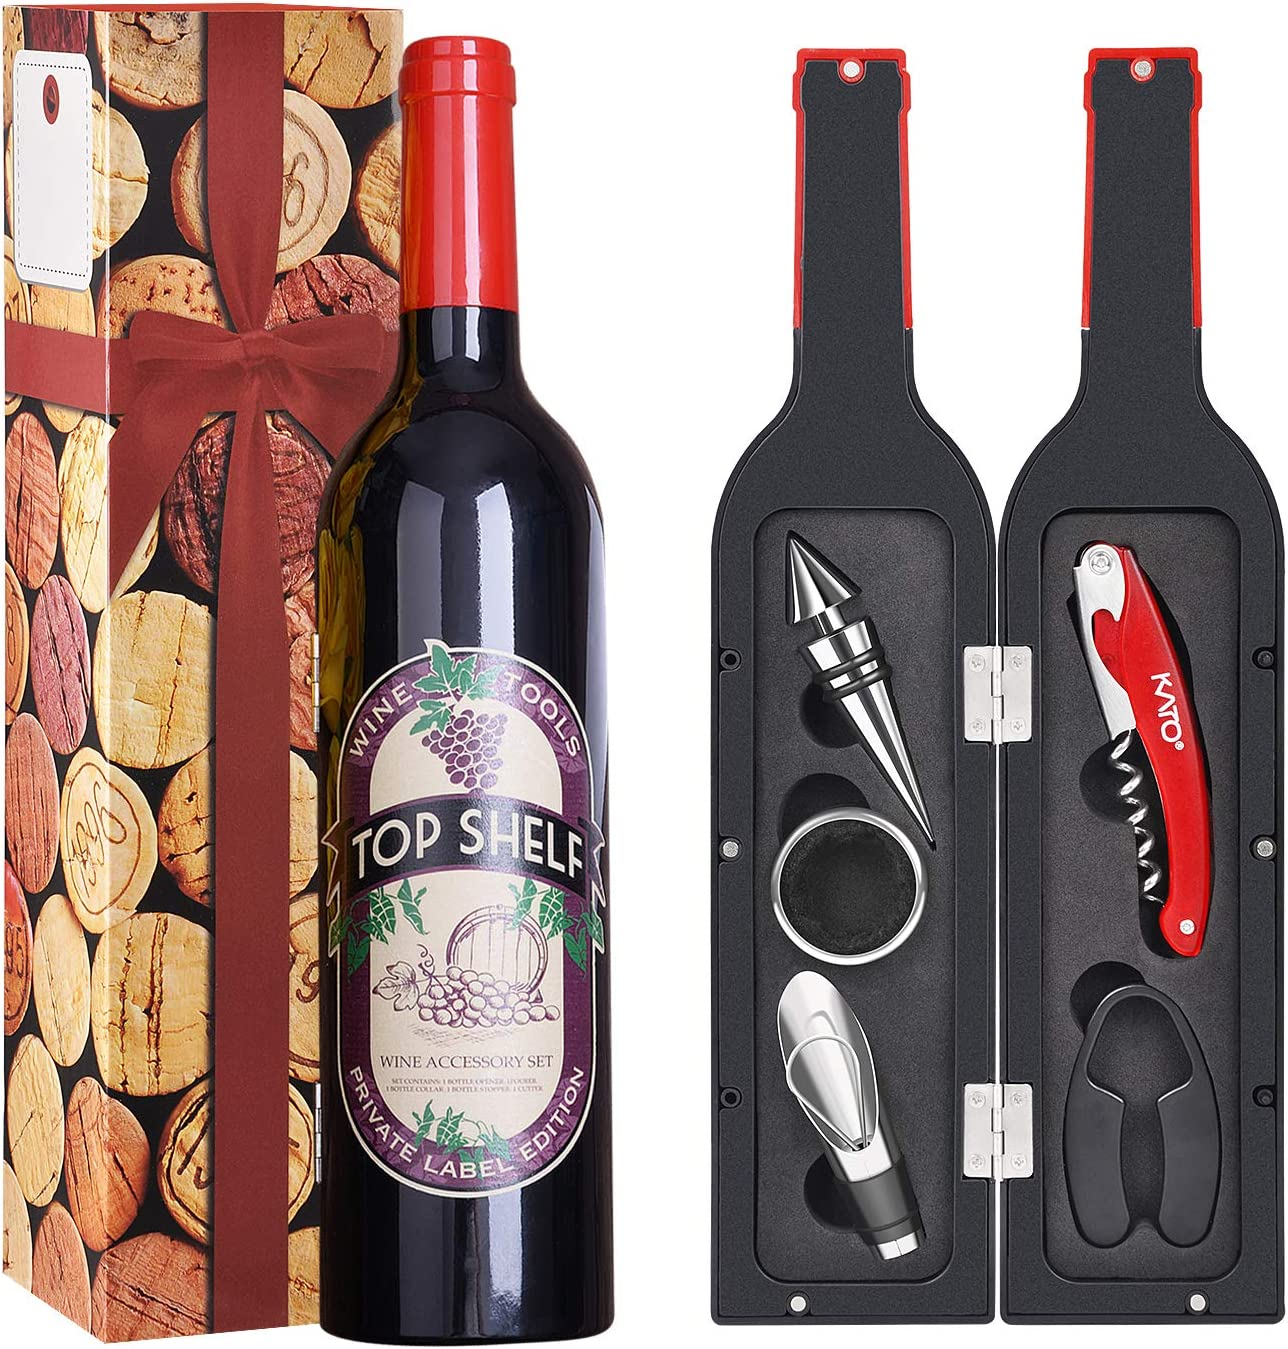 5 Pcs Wine Accessories Gift Set Wine Opener Set Includes